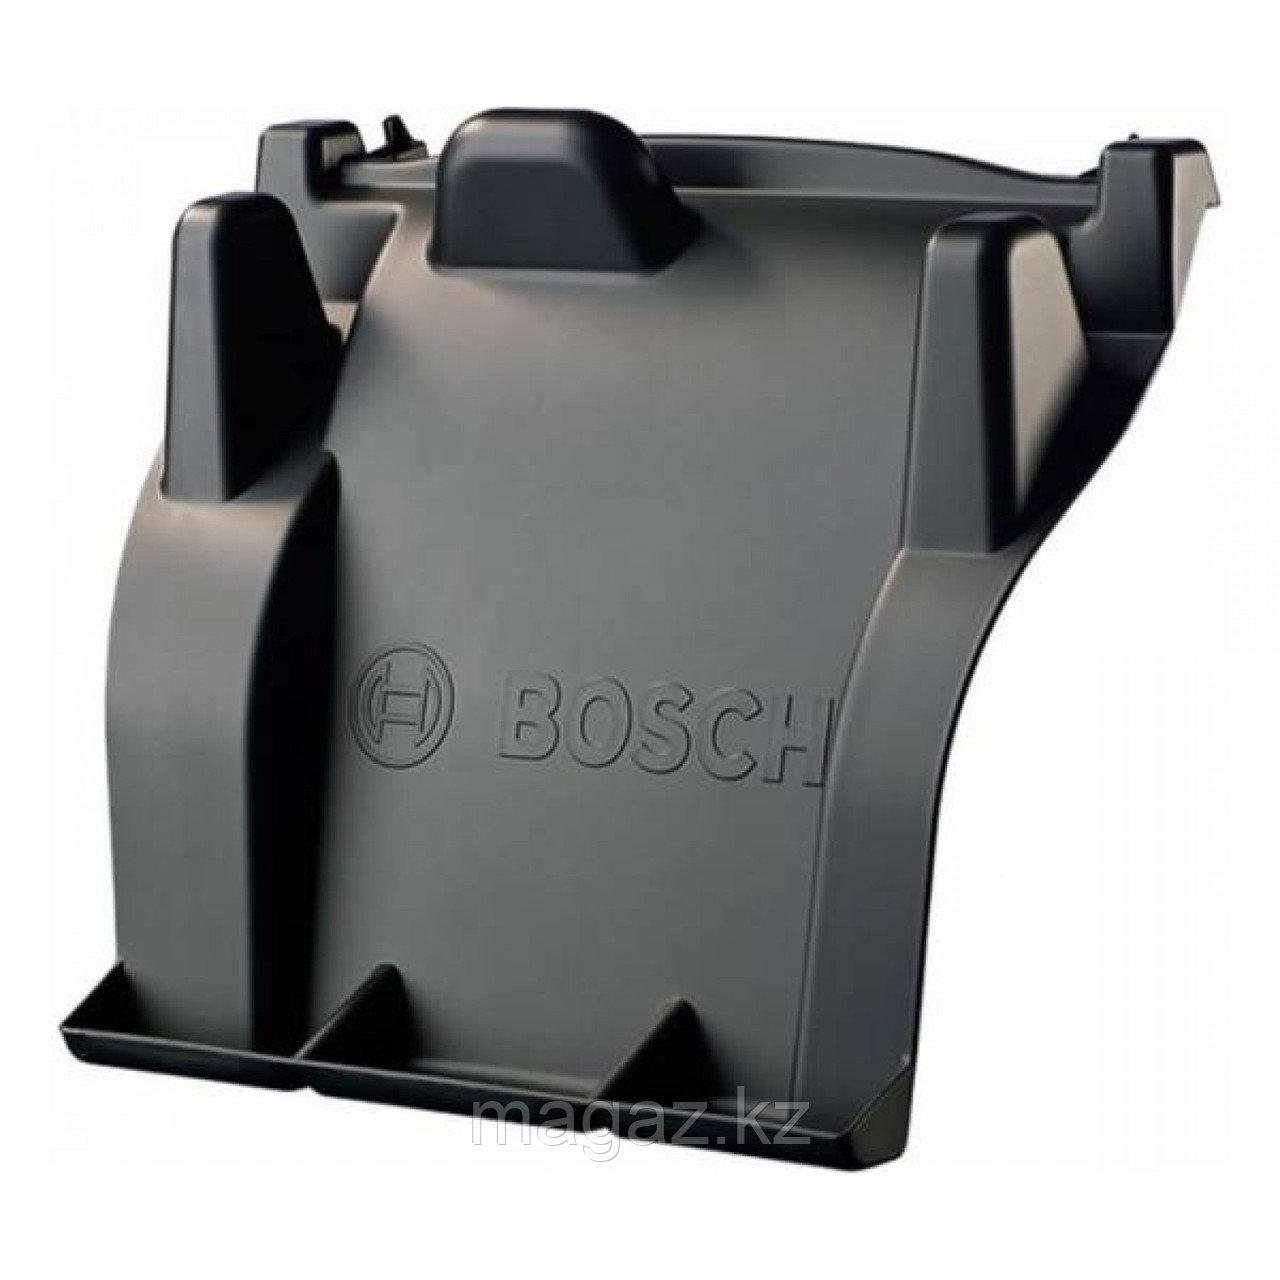 MultiMulch Bosch Rotak 34/37/34LI/37LI